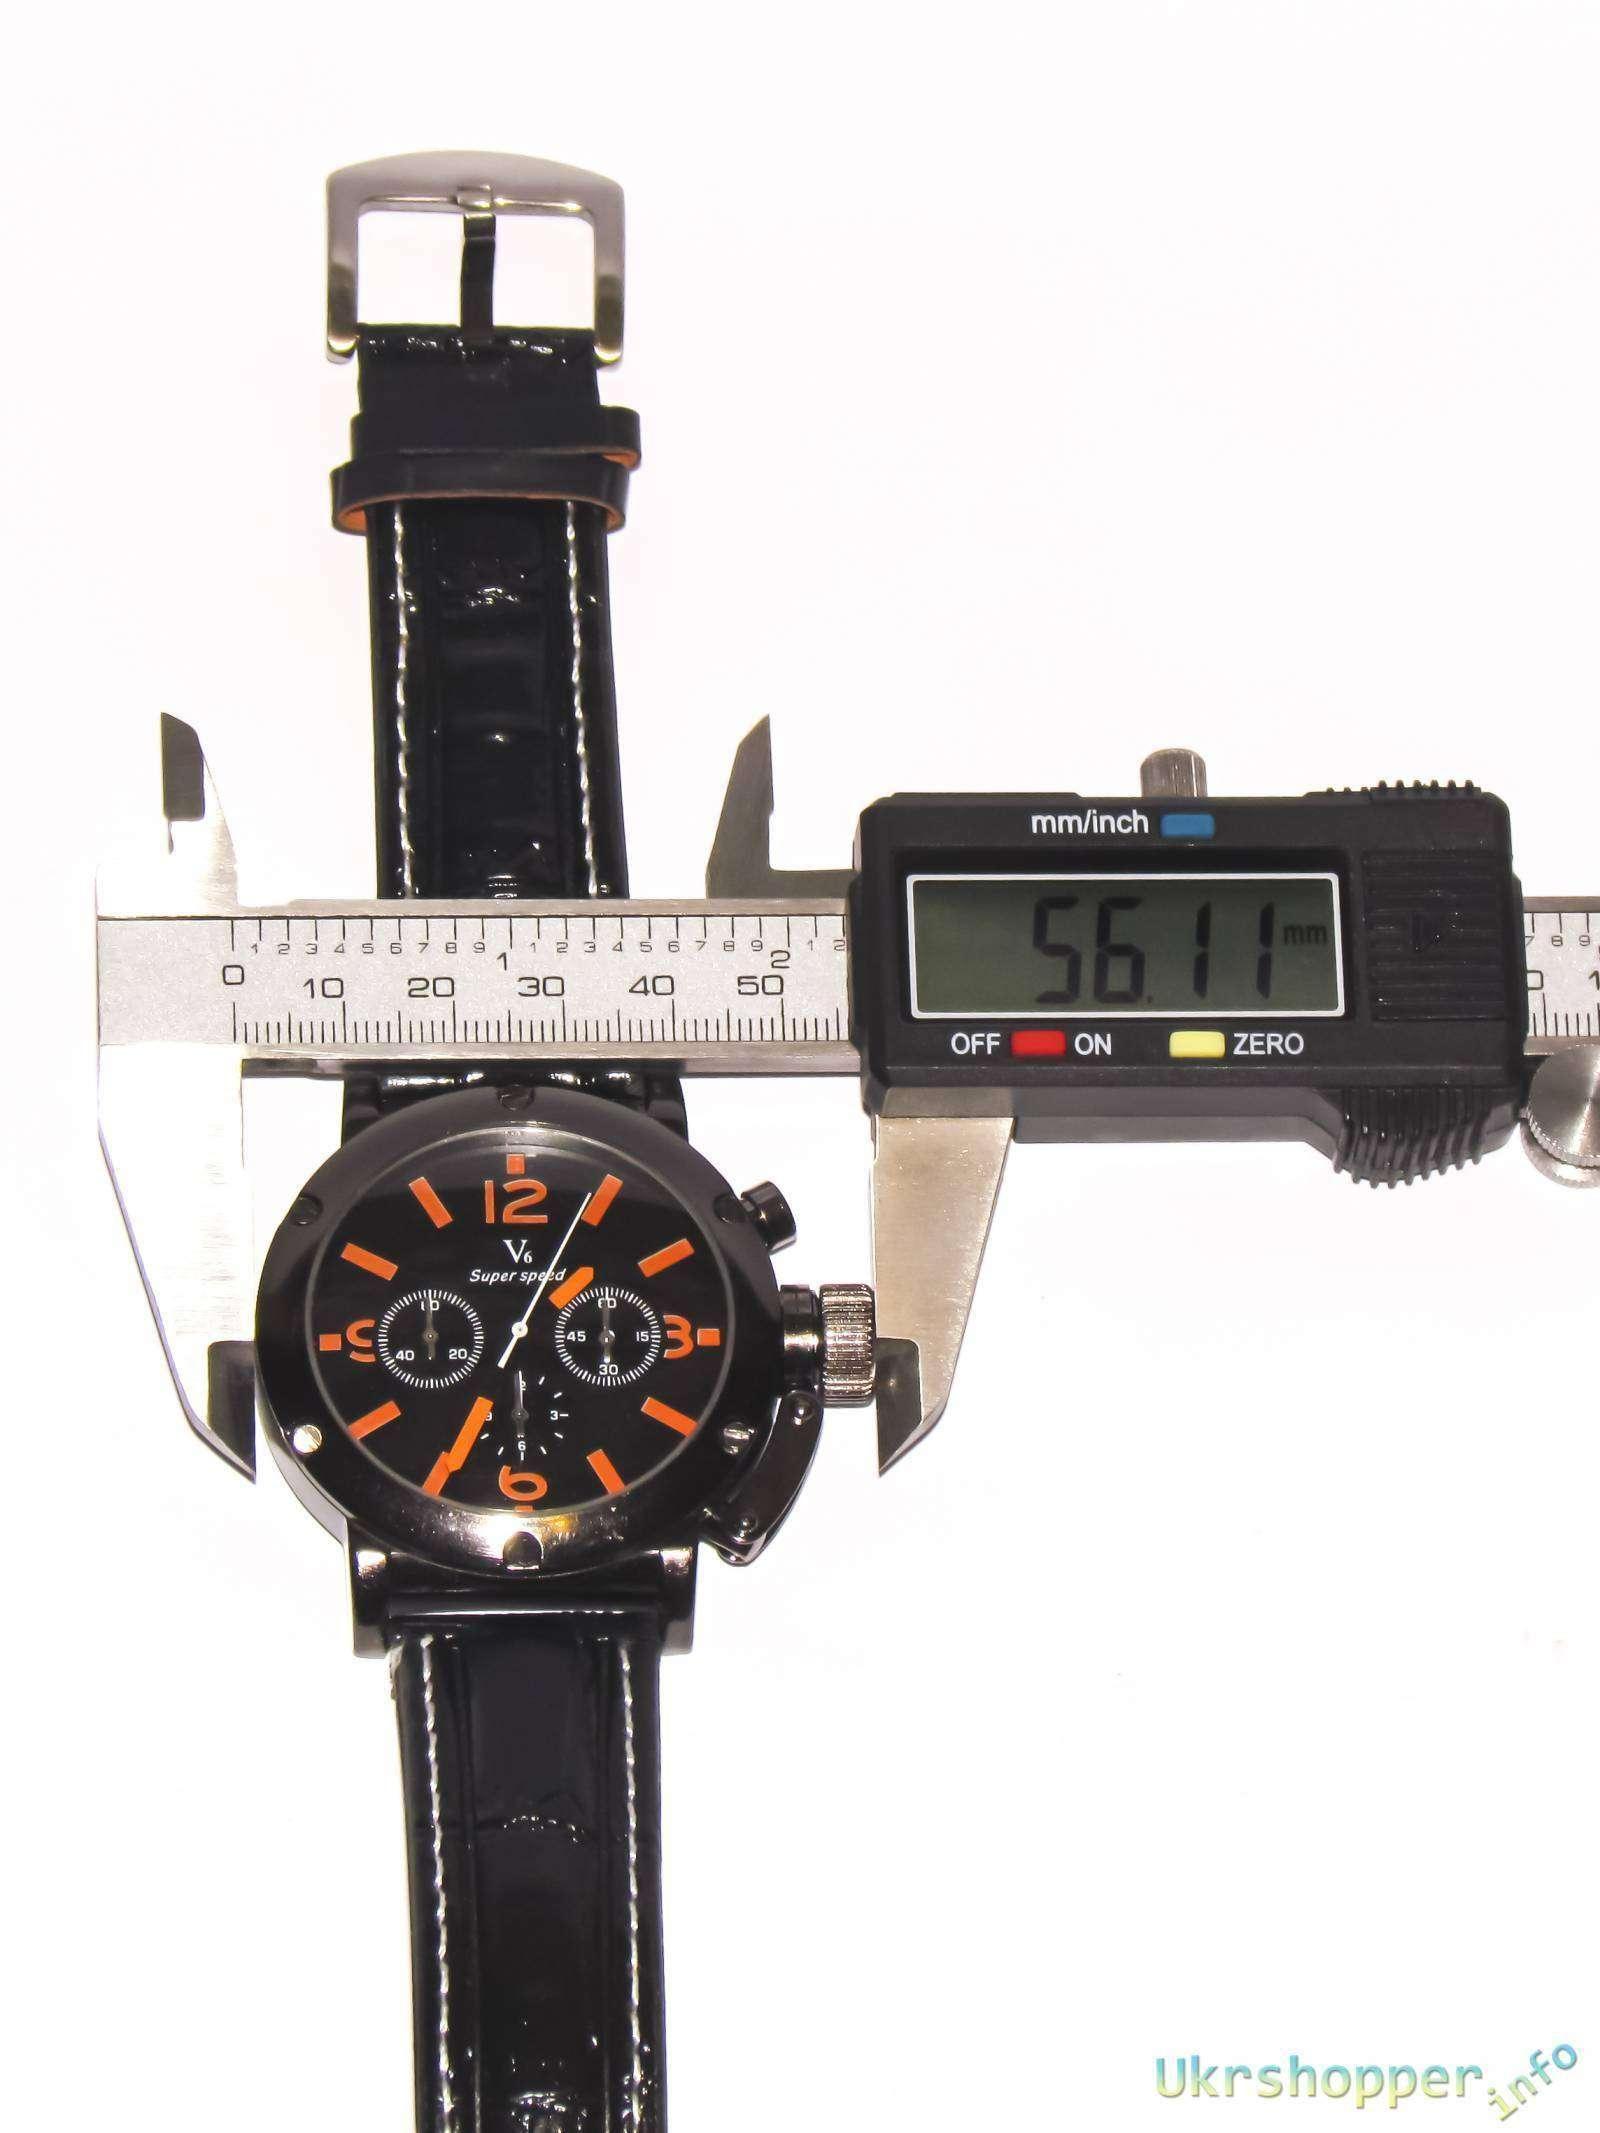 EachBuyer: Обзор недорогих часов с Eachbuyer